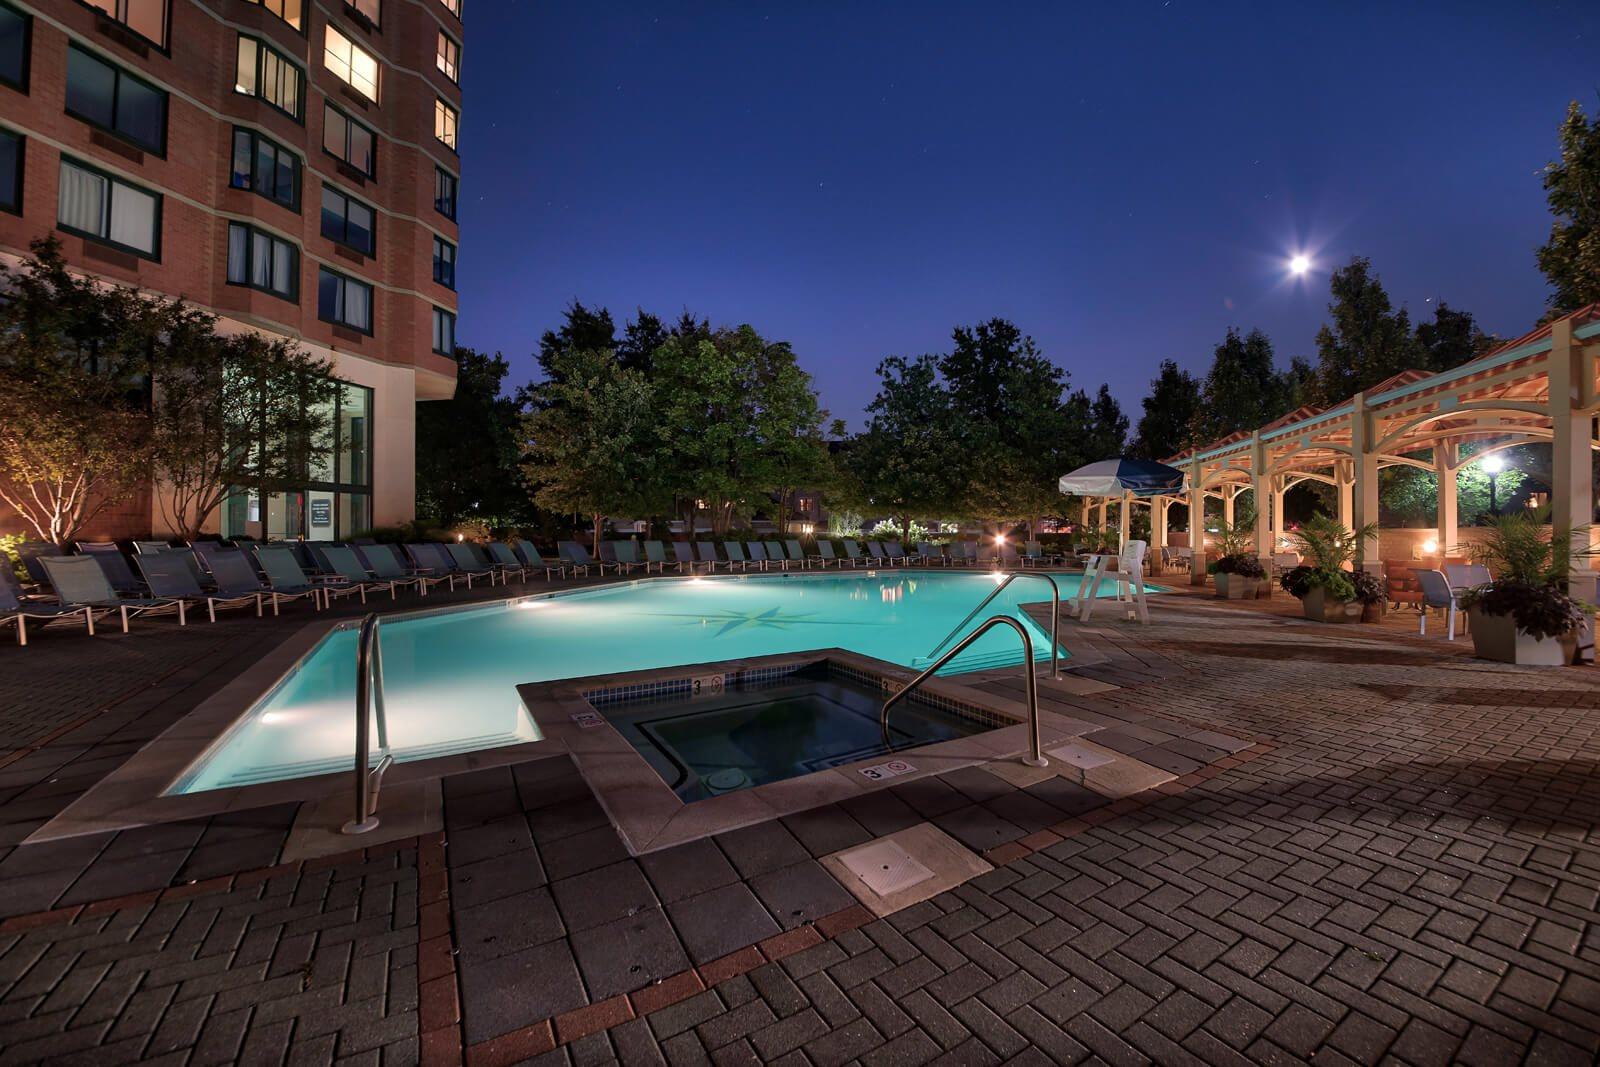 Sparkling Swimming Pool Lights Up at Night at Windsor at Mariners, Edgewater, NJ